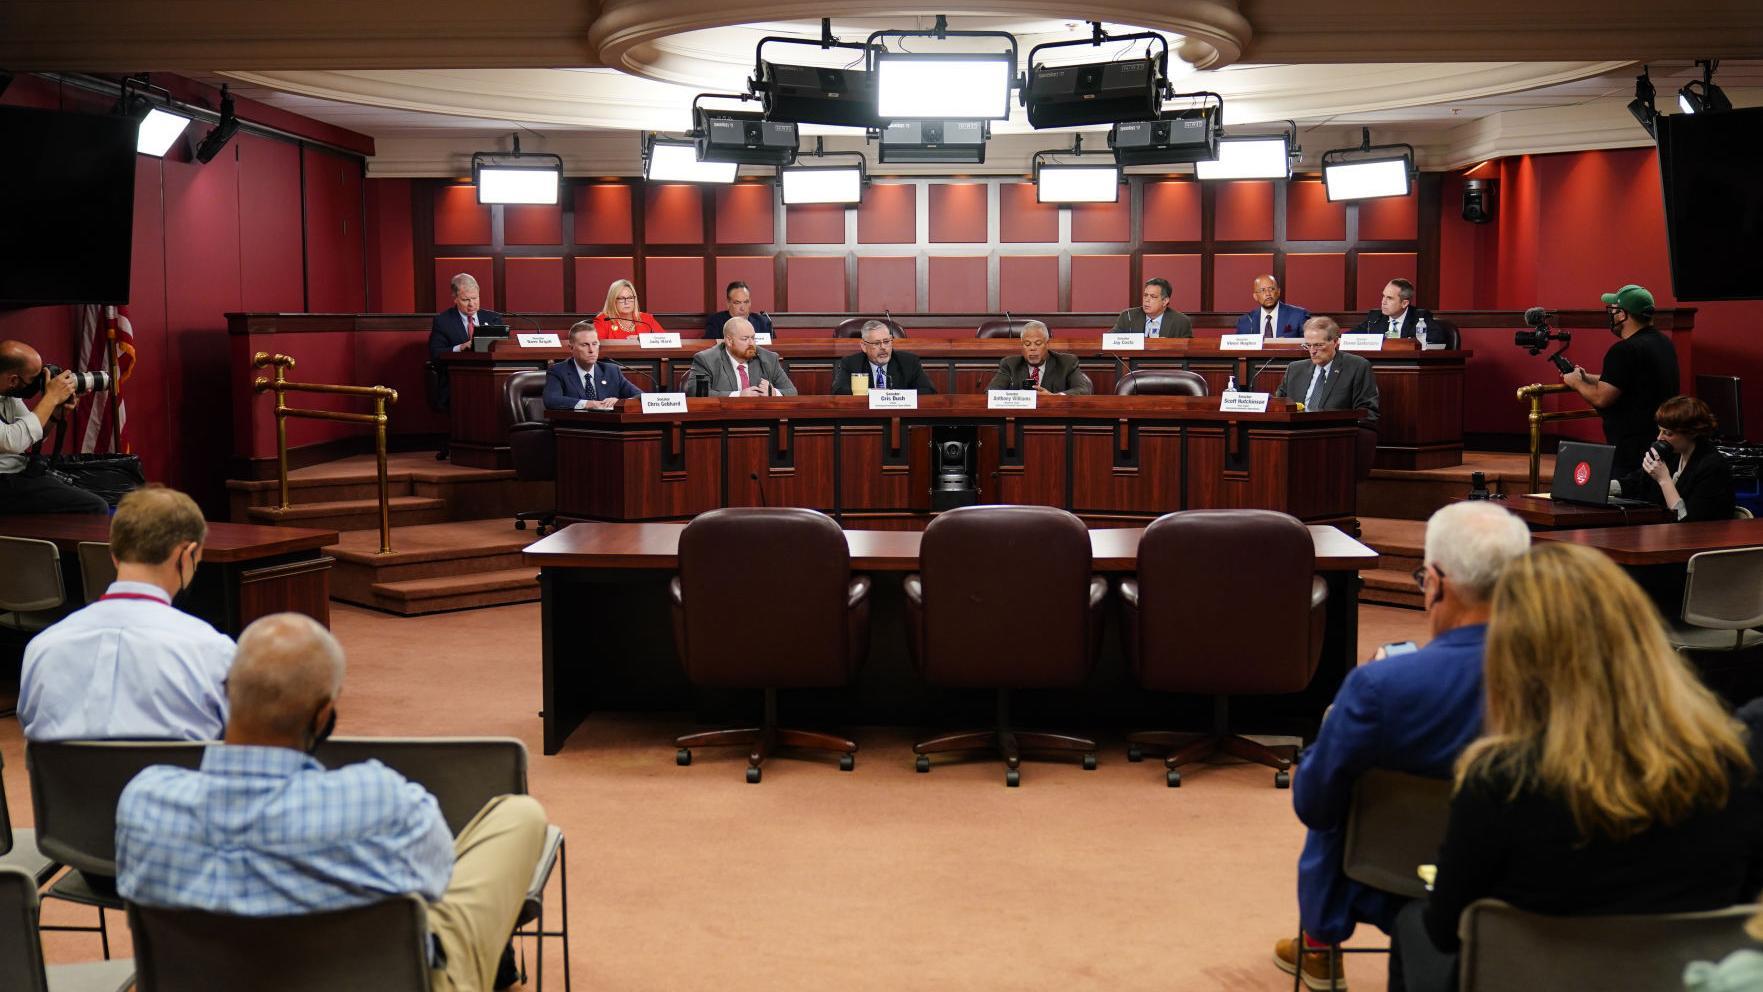 GOP lawmakers vote for subpoena seeking Pa. voter information